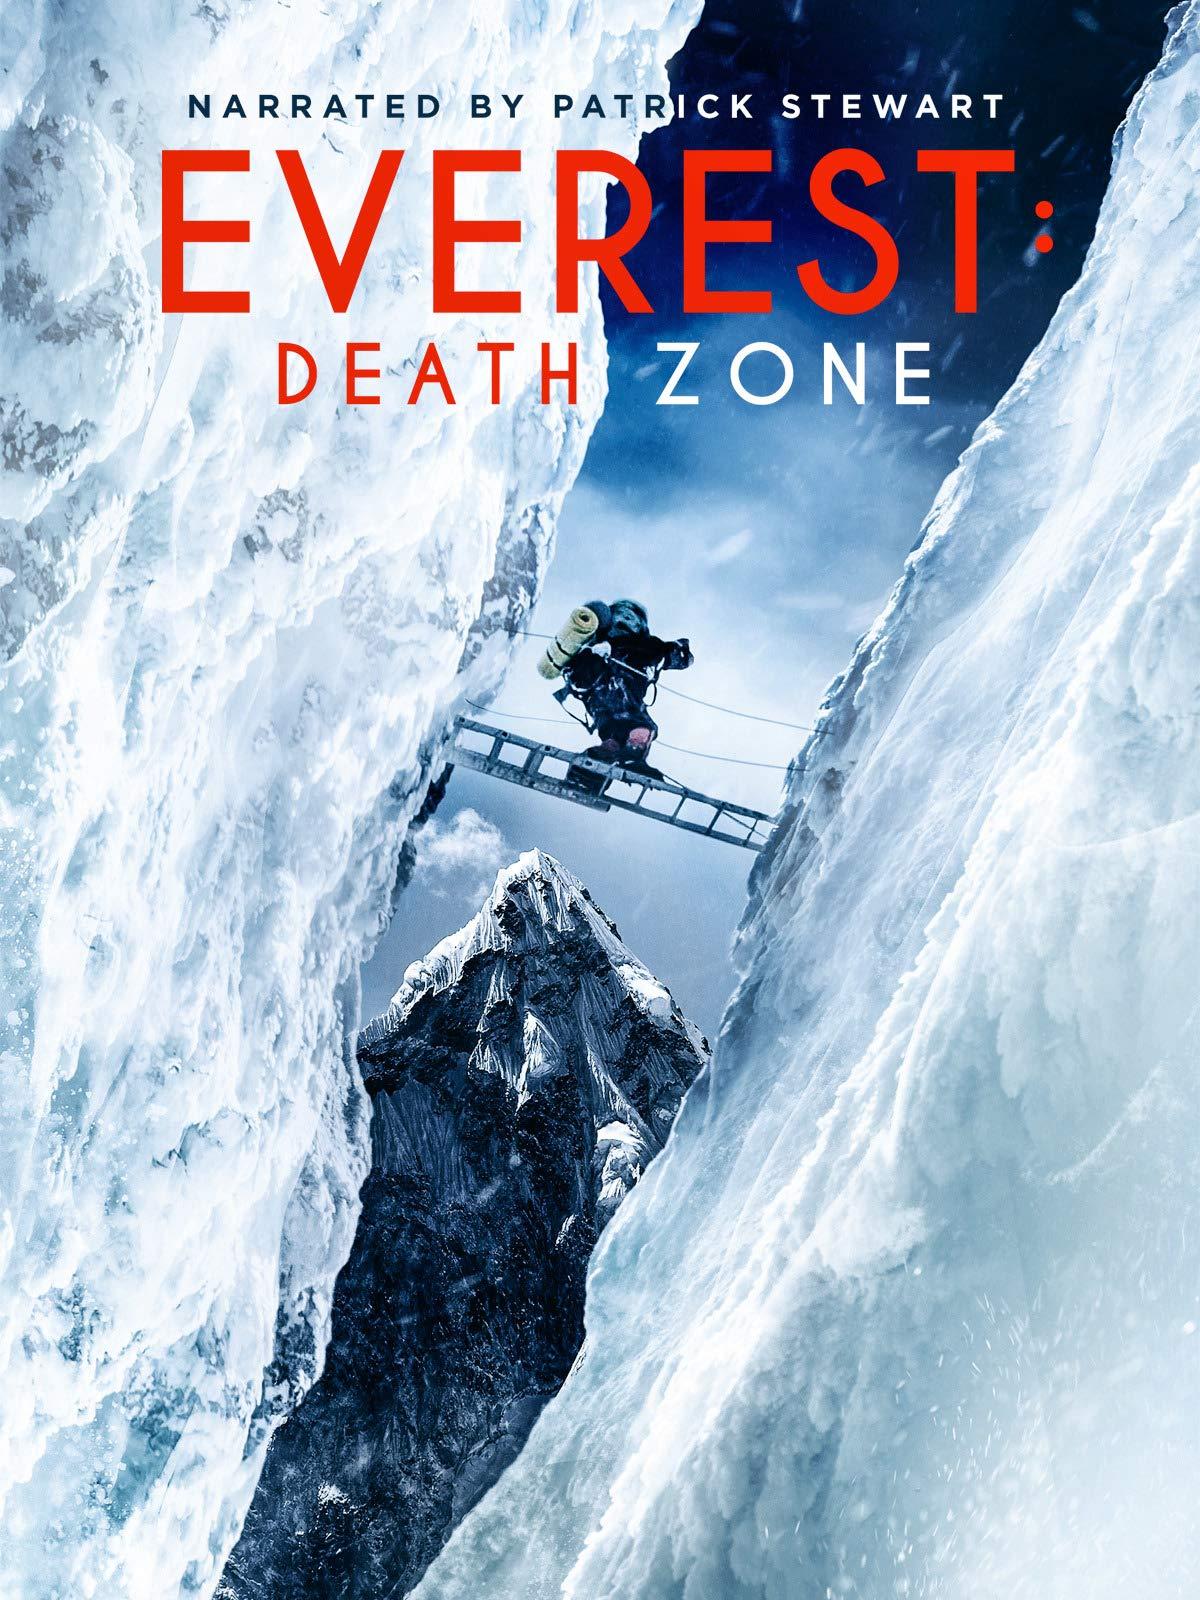 Everest: Death Zone